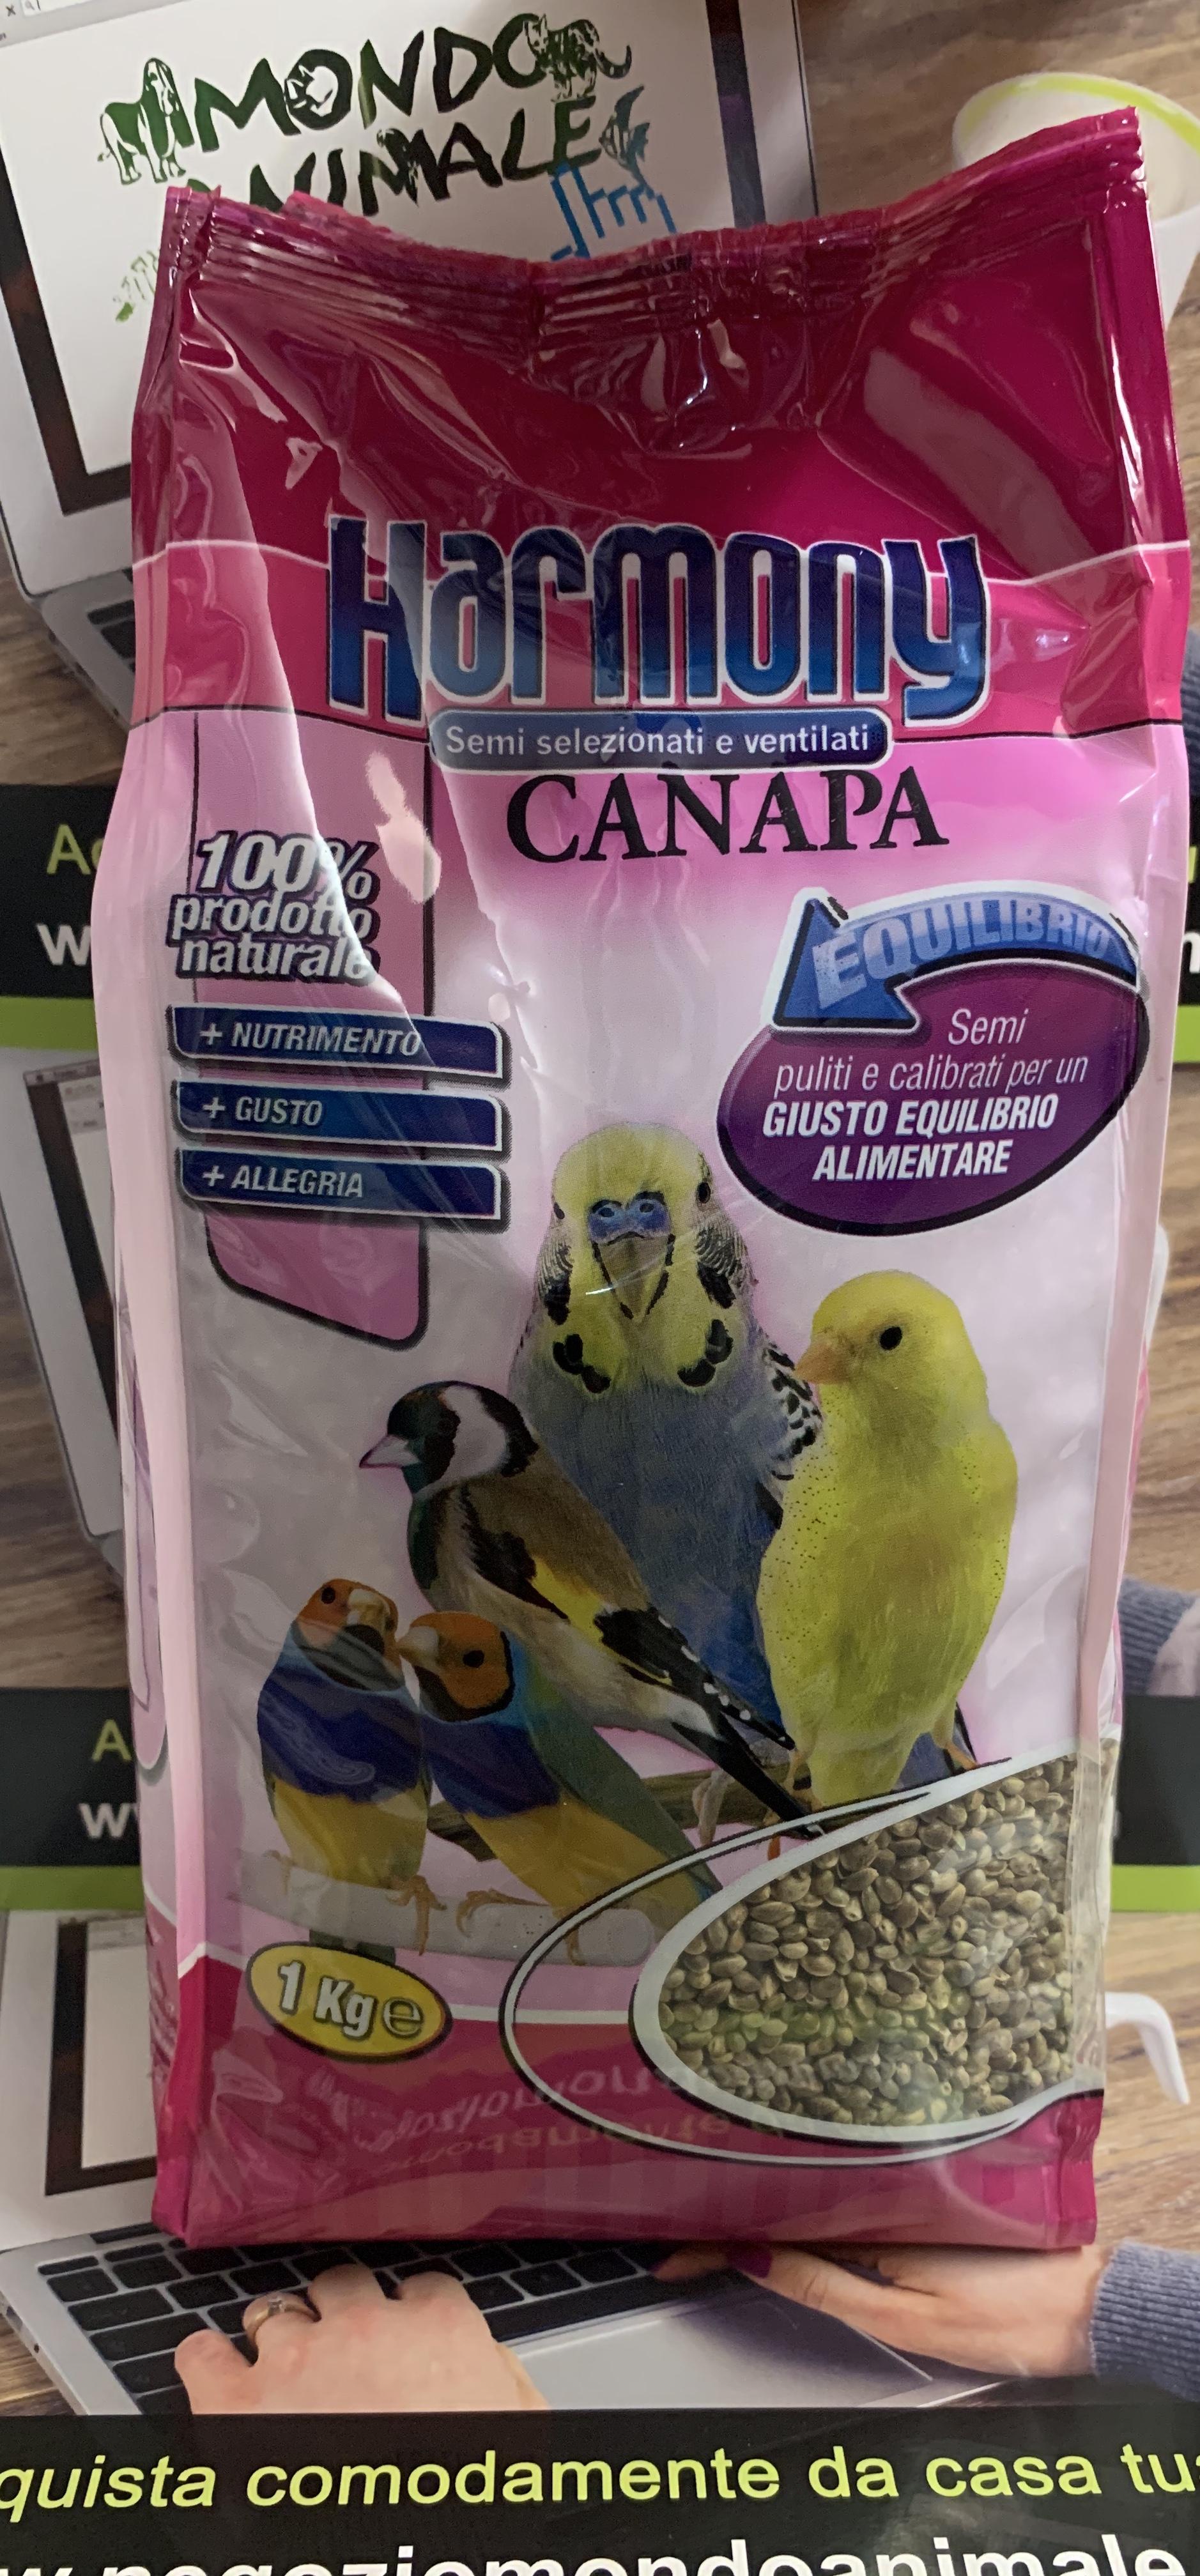 CANAPA 1kg